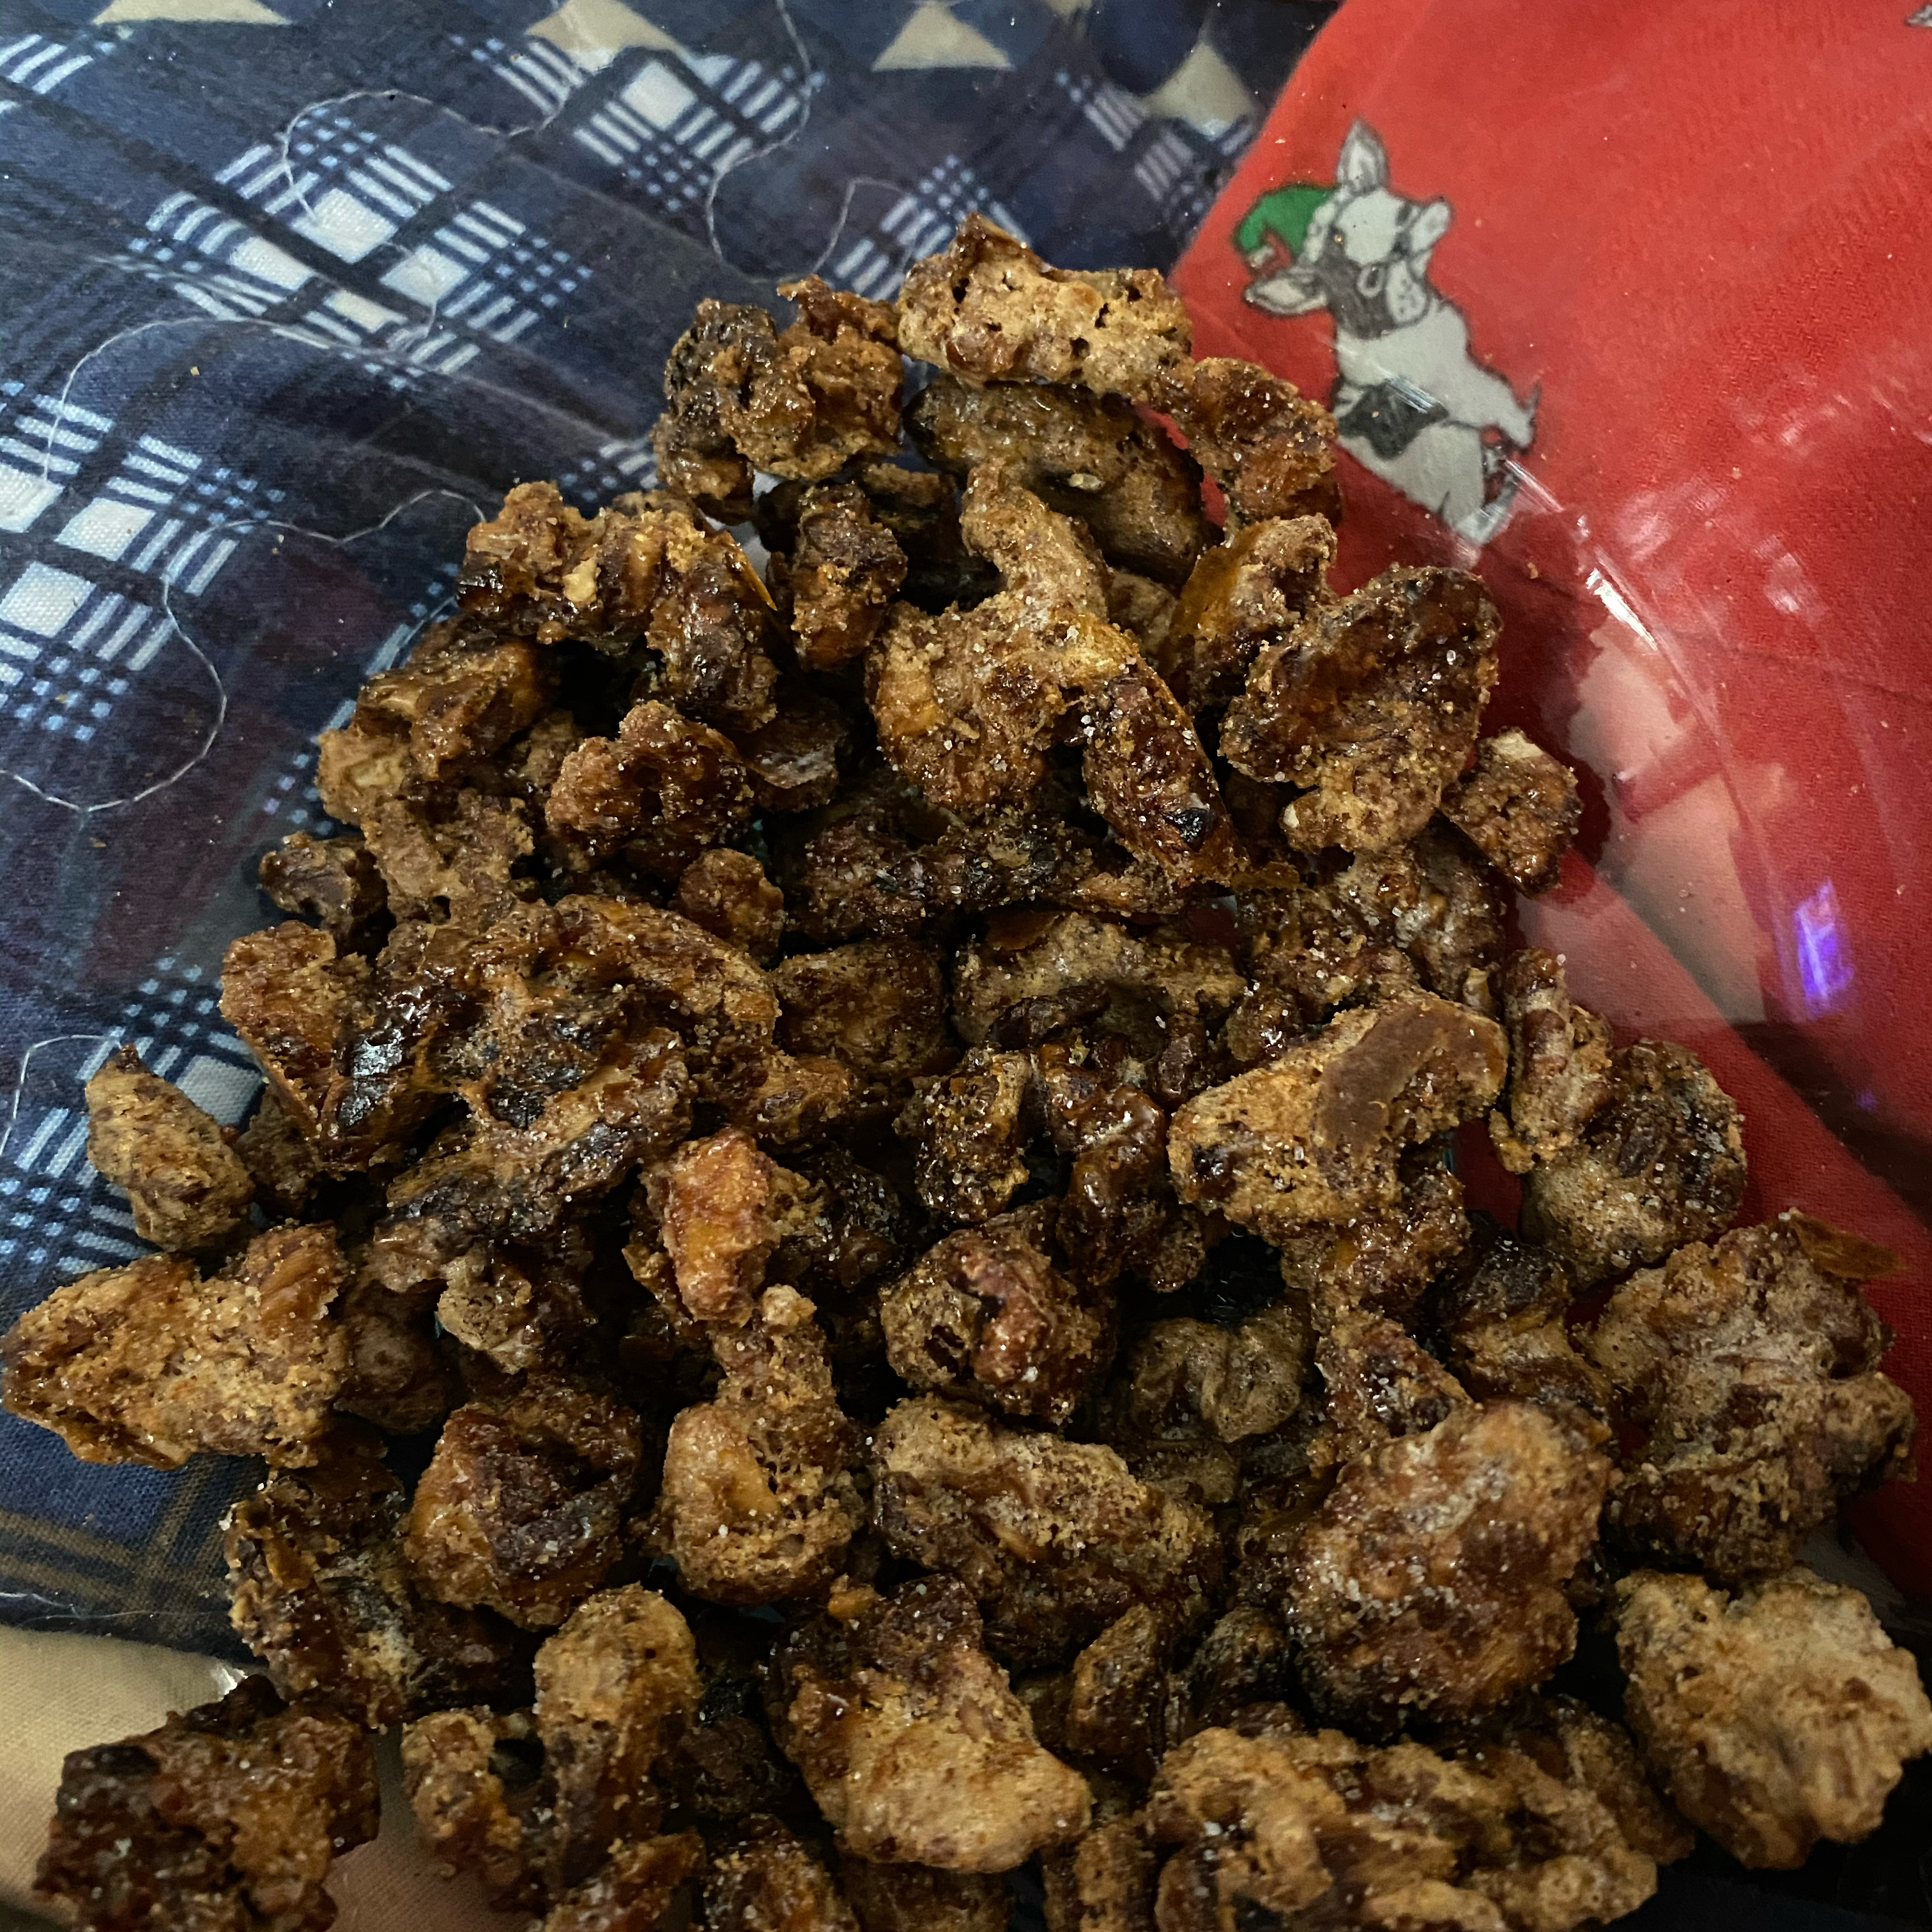 Crusted Cinnamon Walnuts